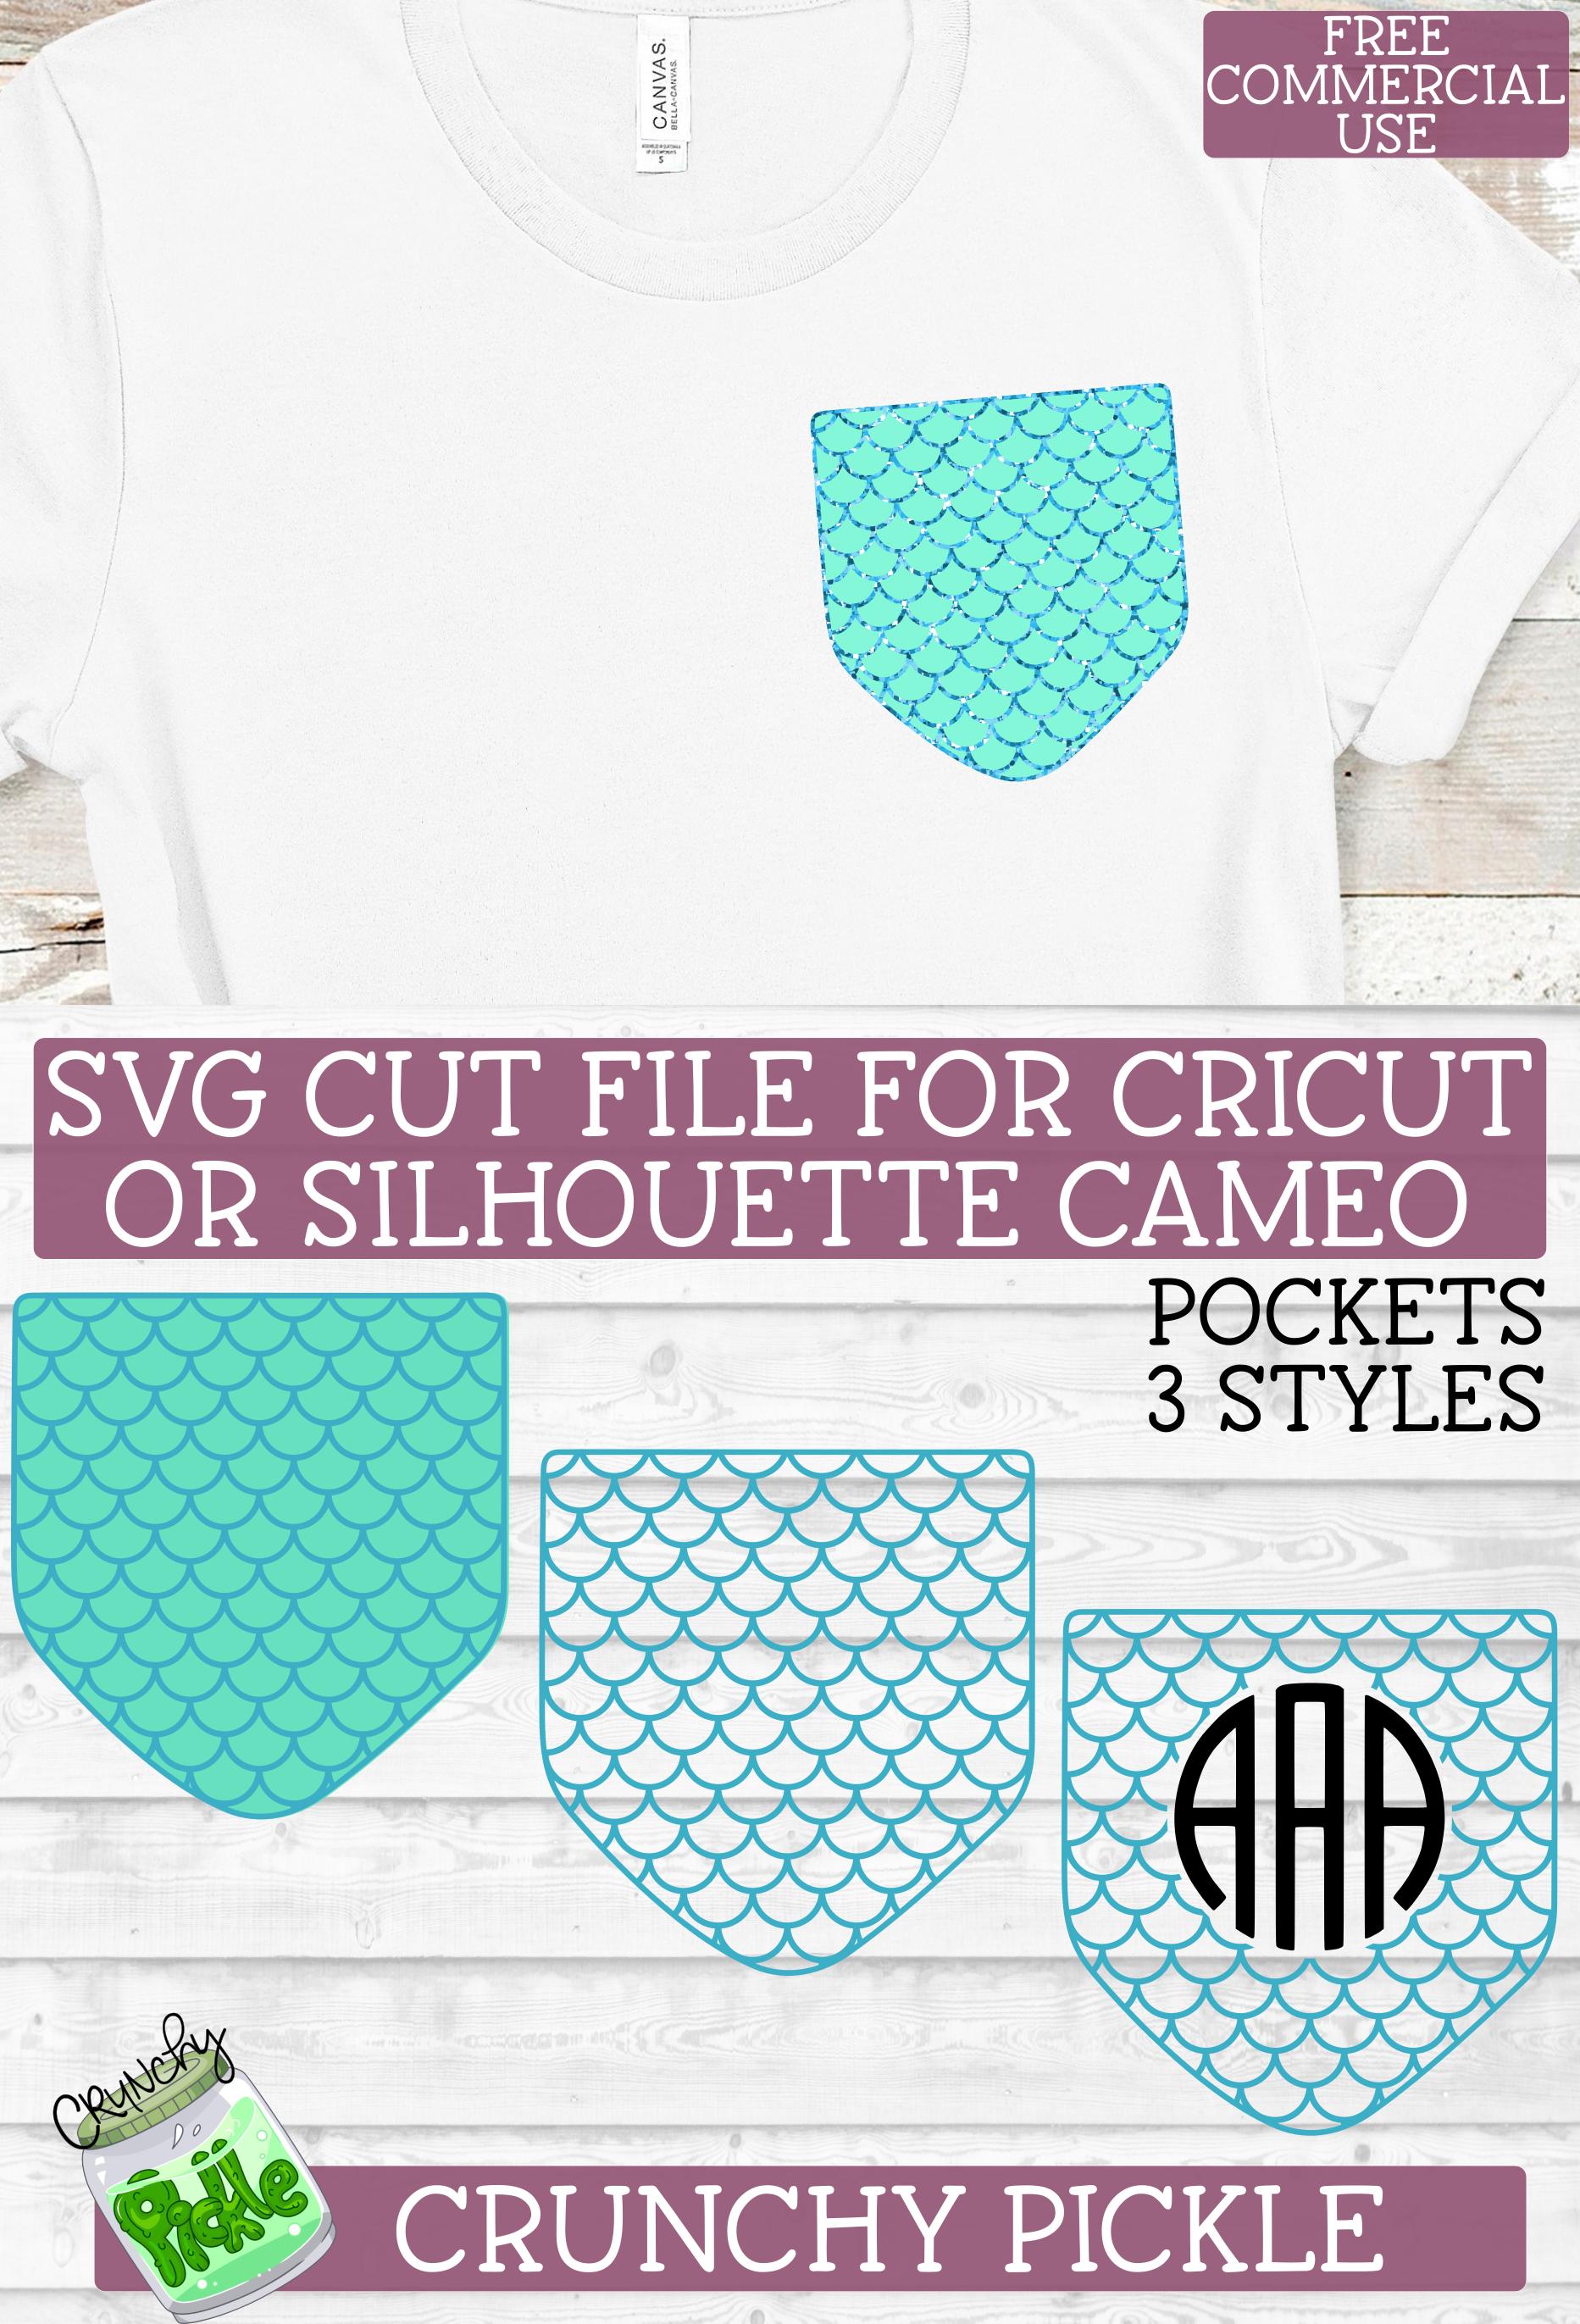 Pickle Pockets Monogram Pocket Mermaid Scales SVG File